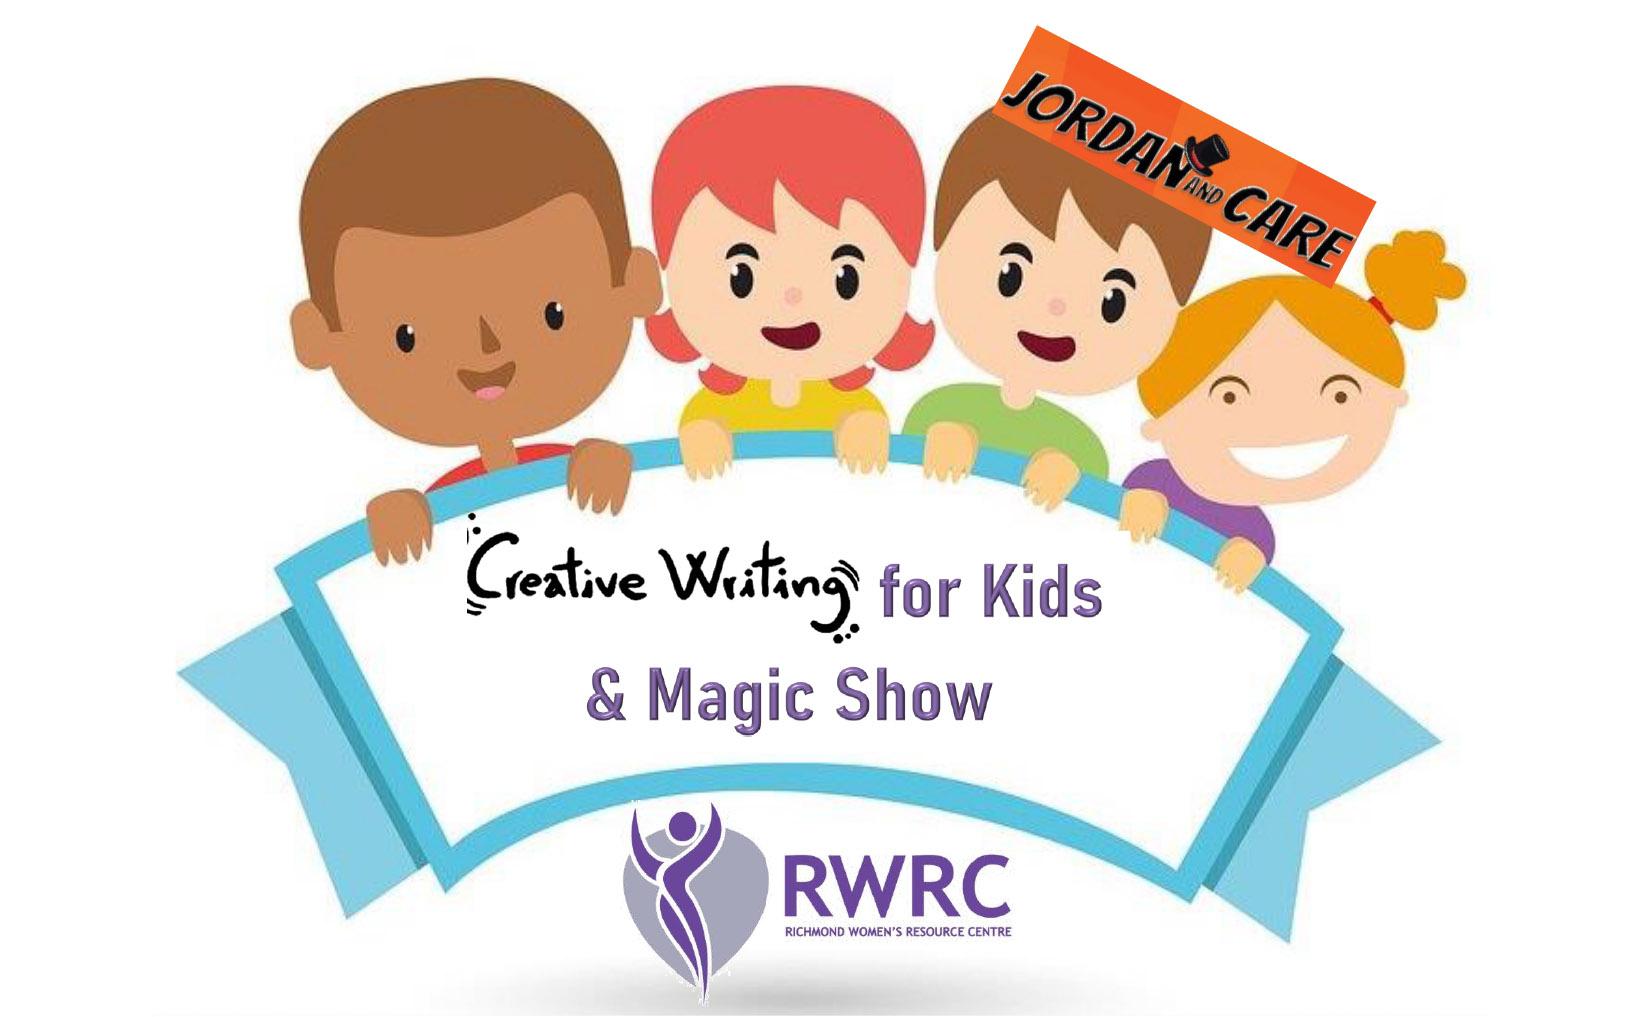 Creative Writing for Kids & Magic Show